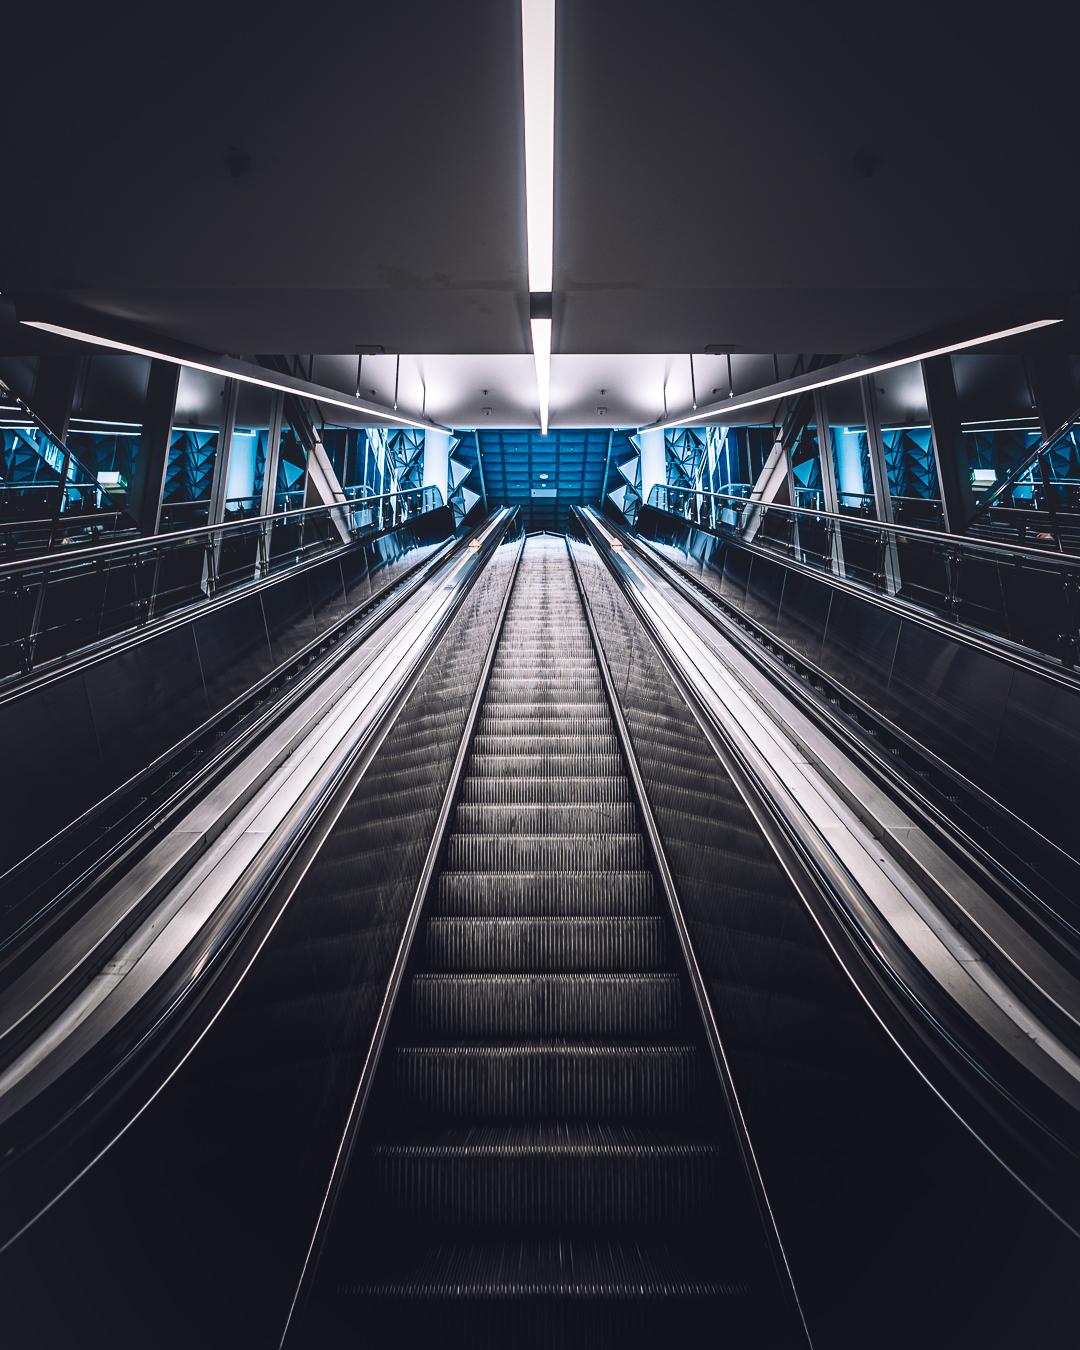 Frankfurt Flughafen Terminal 1, Germany